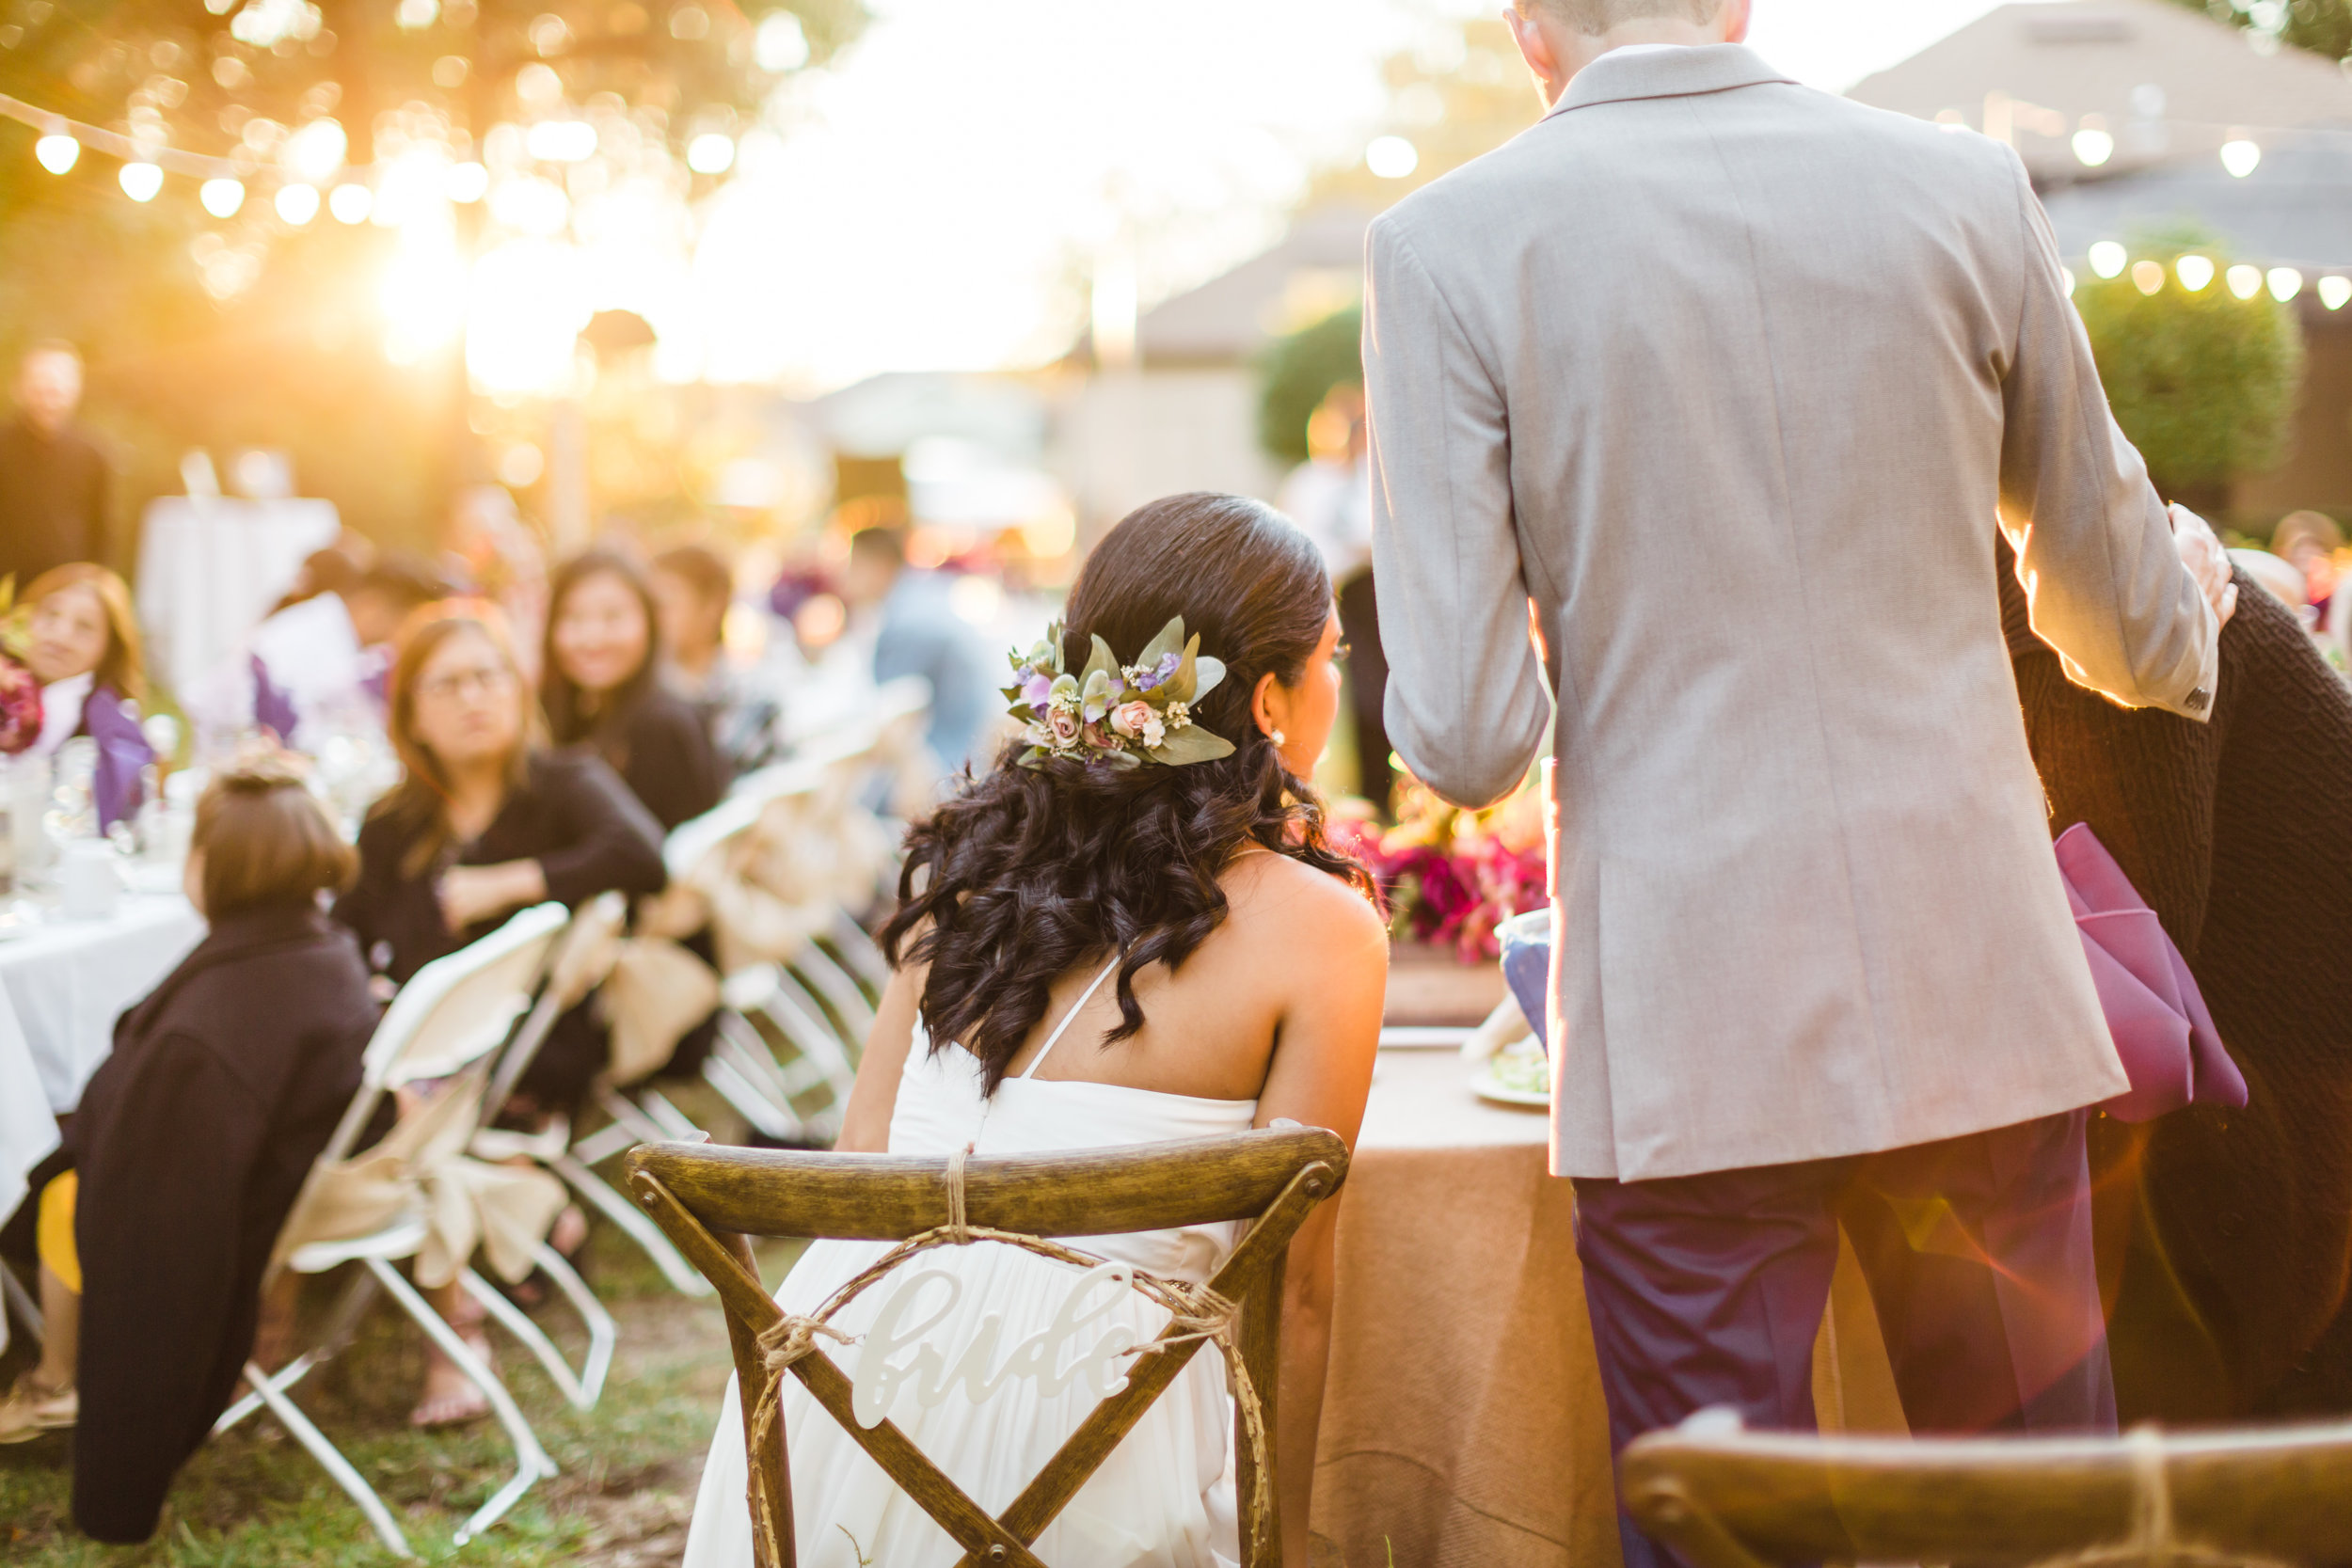 2018.11.03 Jael and Edel Ocala Wedding FINALS (336 of 441).jpg